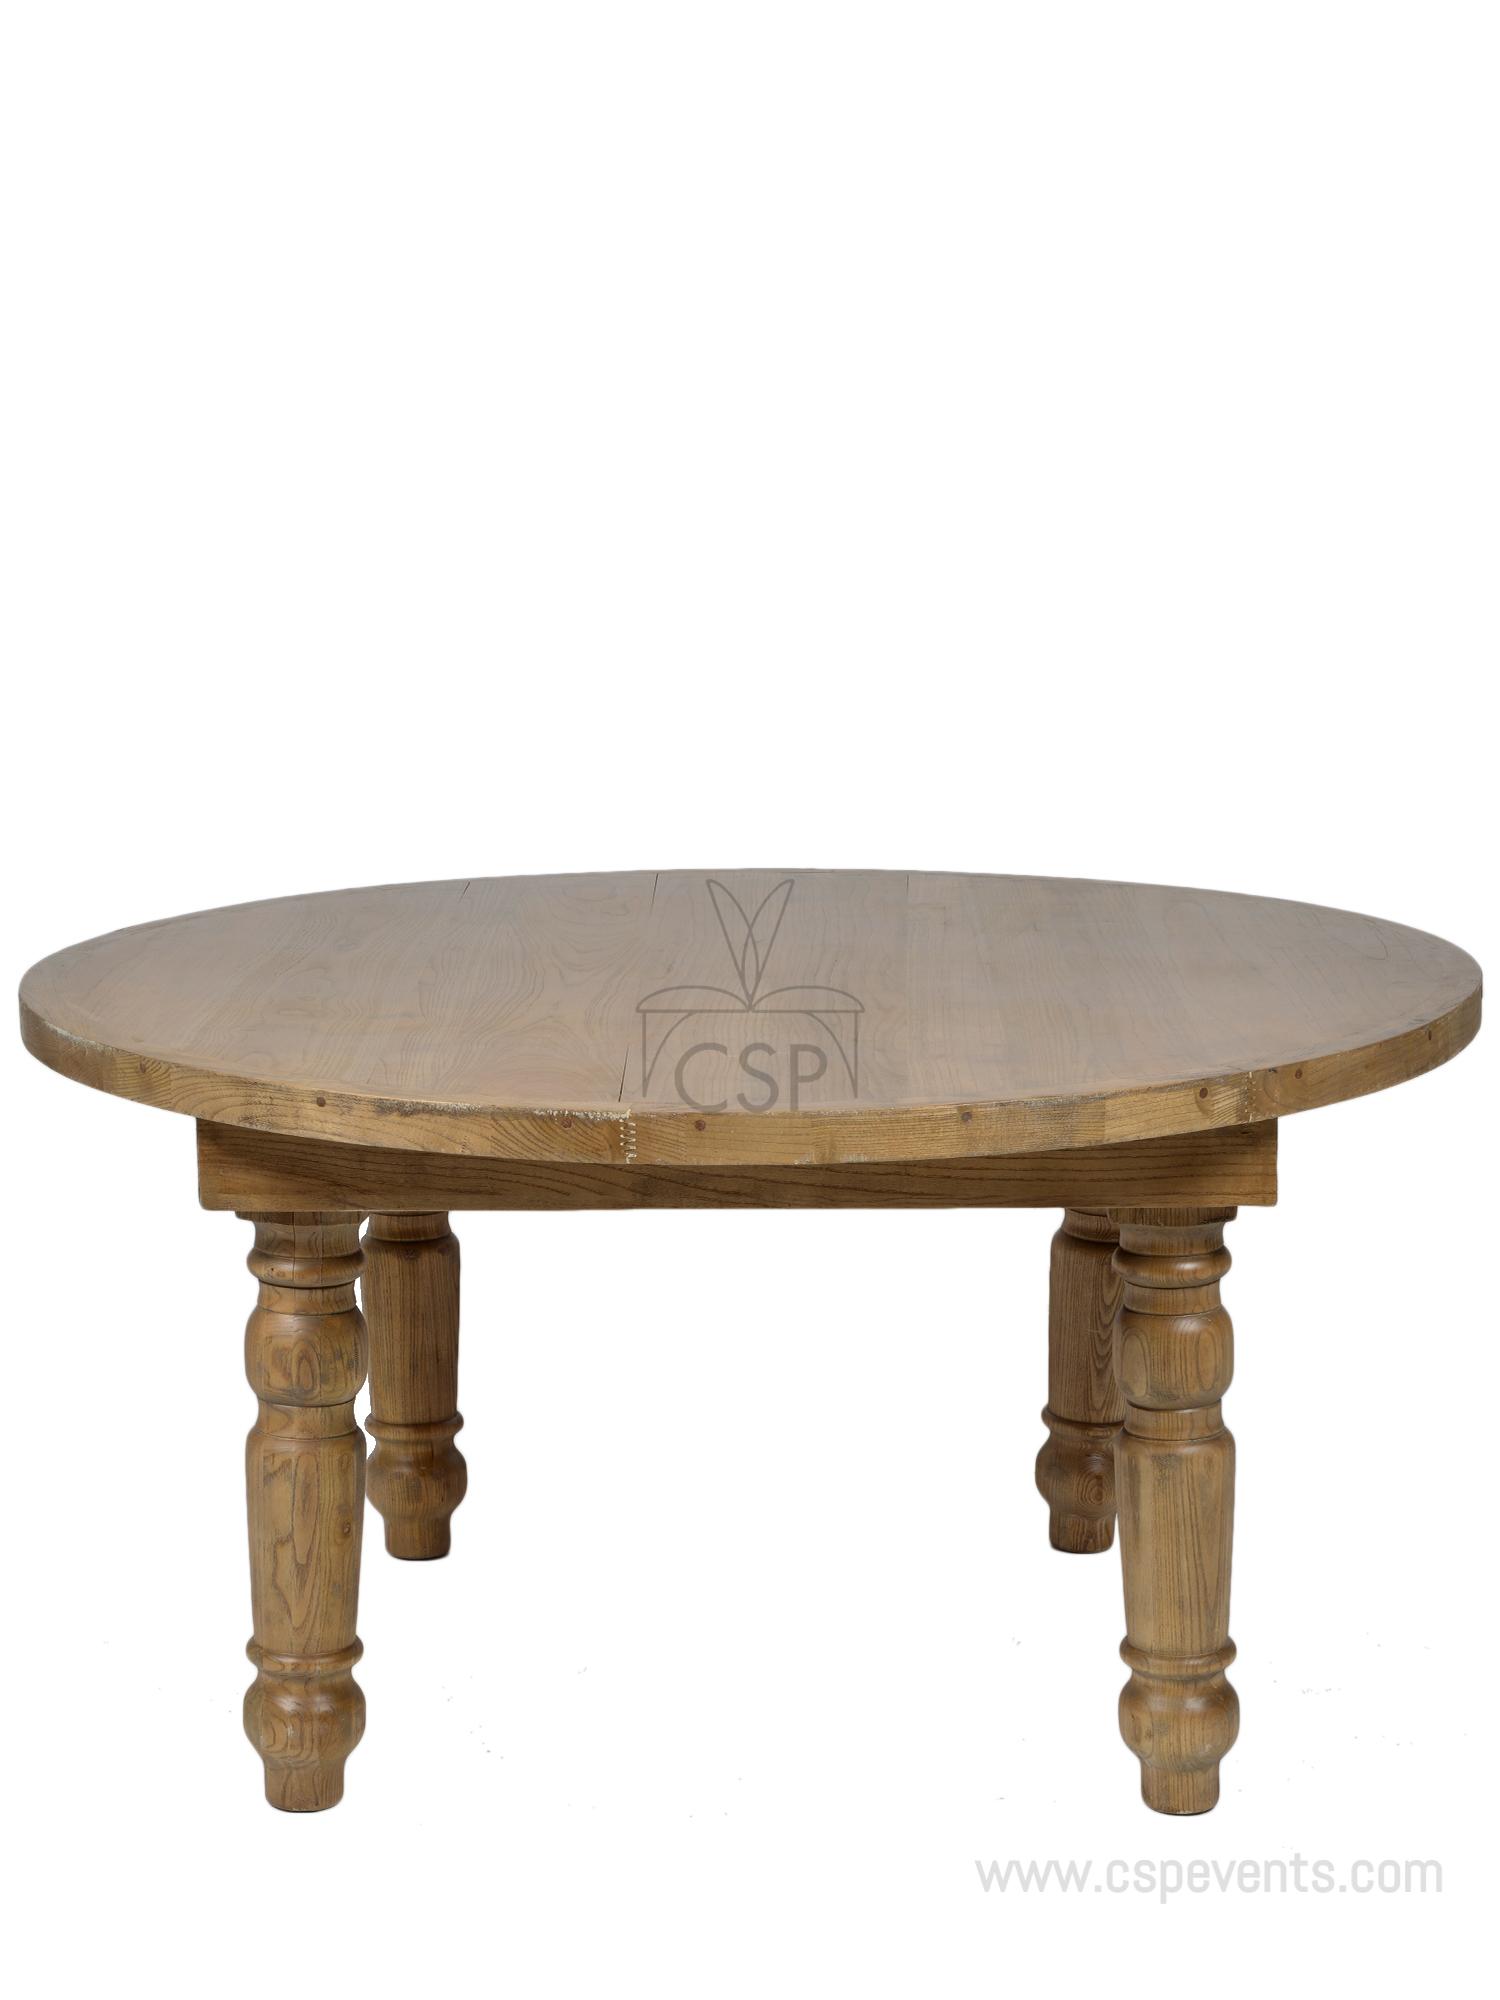 Round Foldable Farm Table Csp